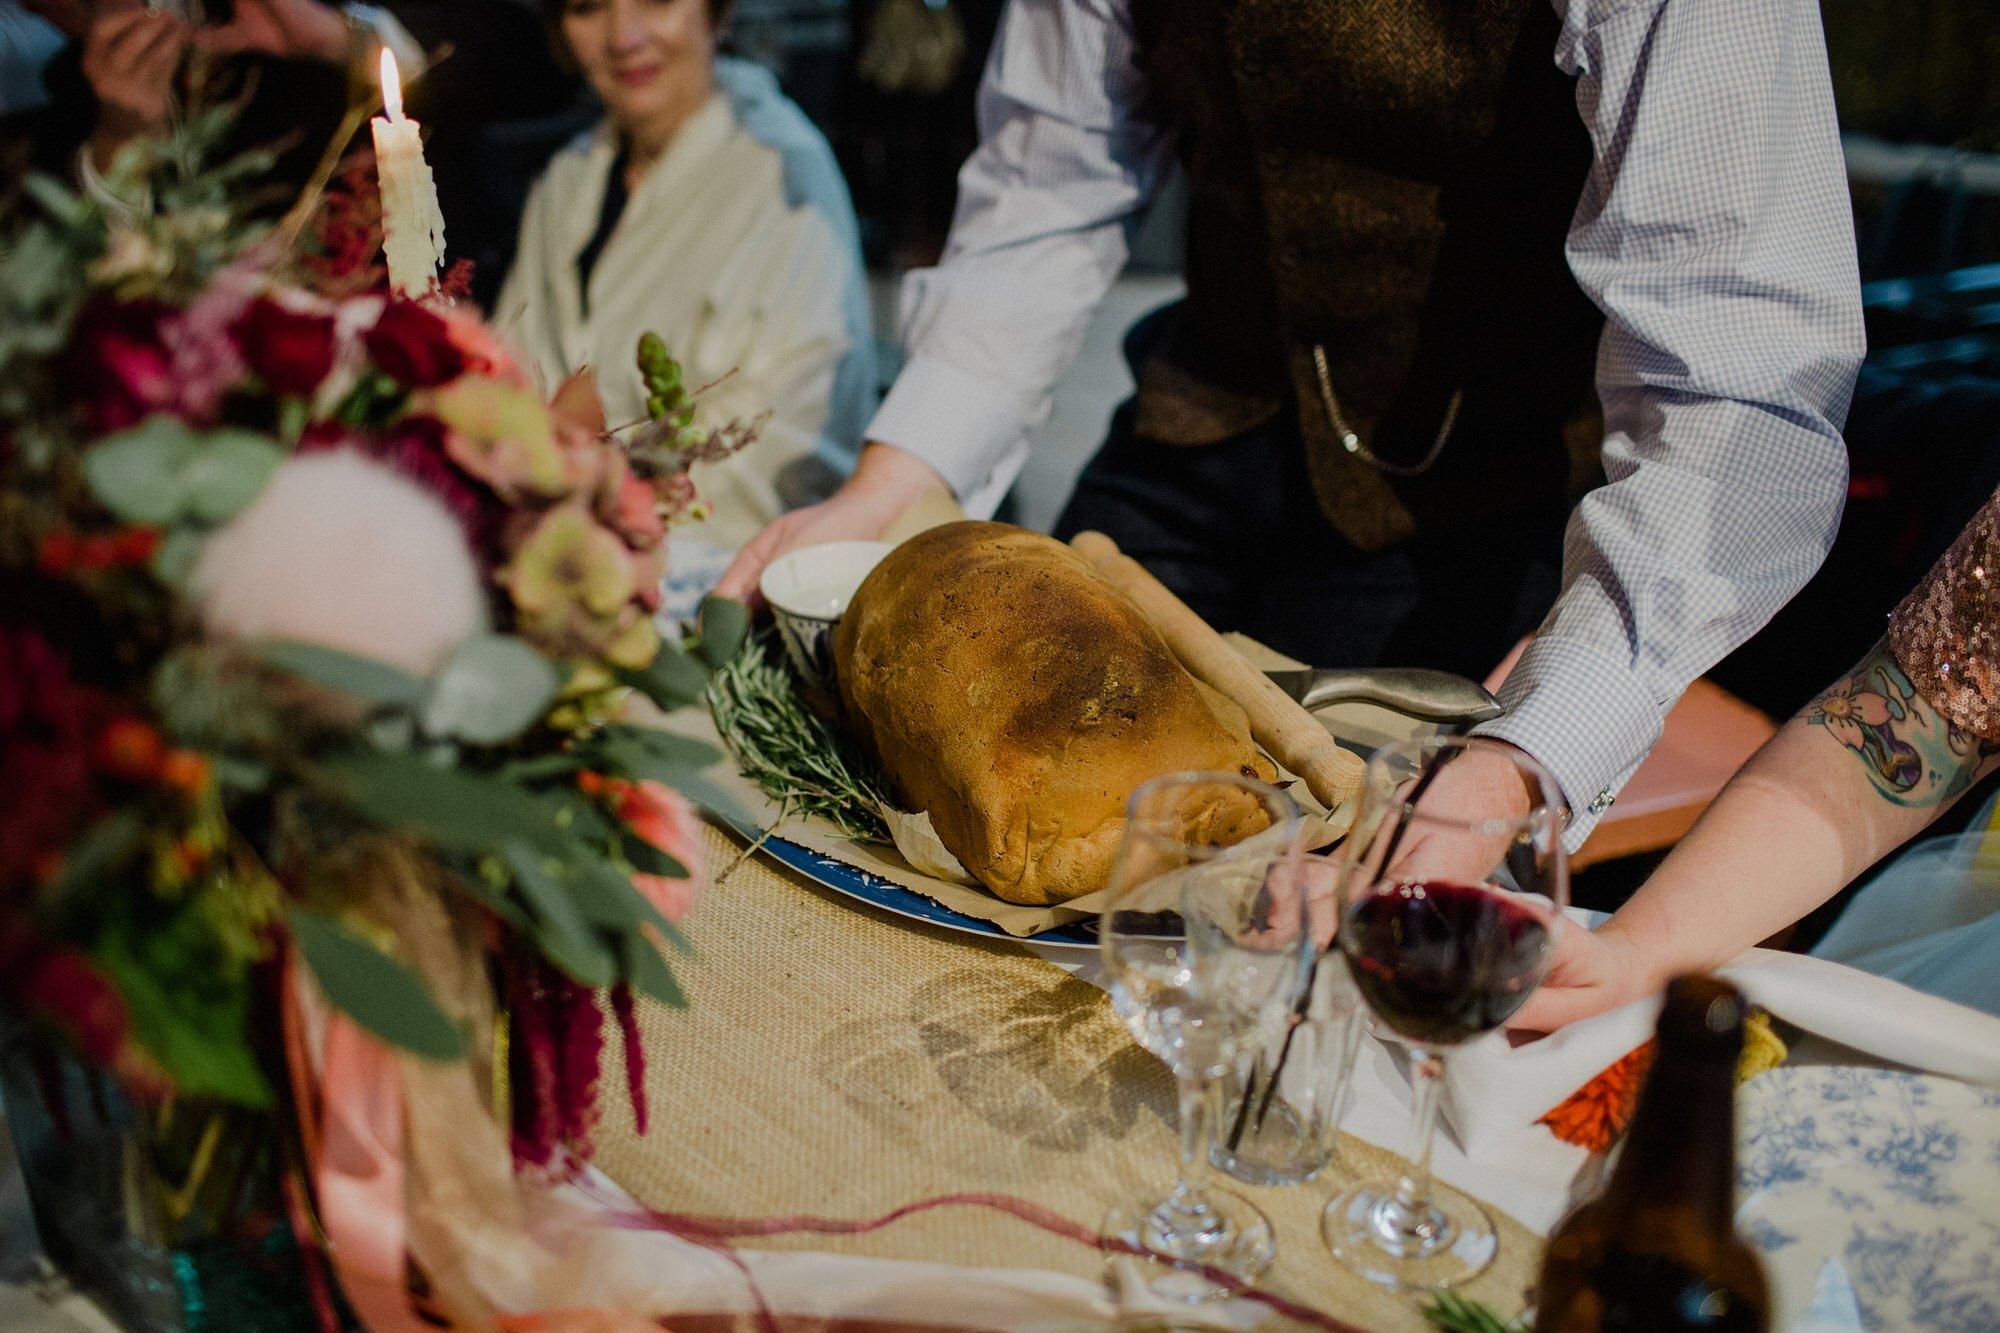 070 TIN SHED KNOCKRAICH FARM WEDDING ALTERNATIVE BRIDE ZOE ALEXANDRA PHOTOGRAPHY